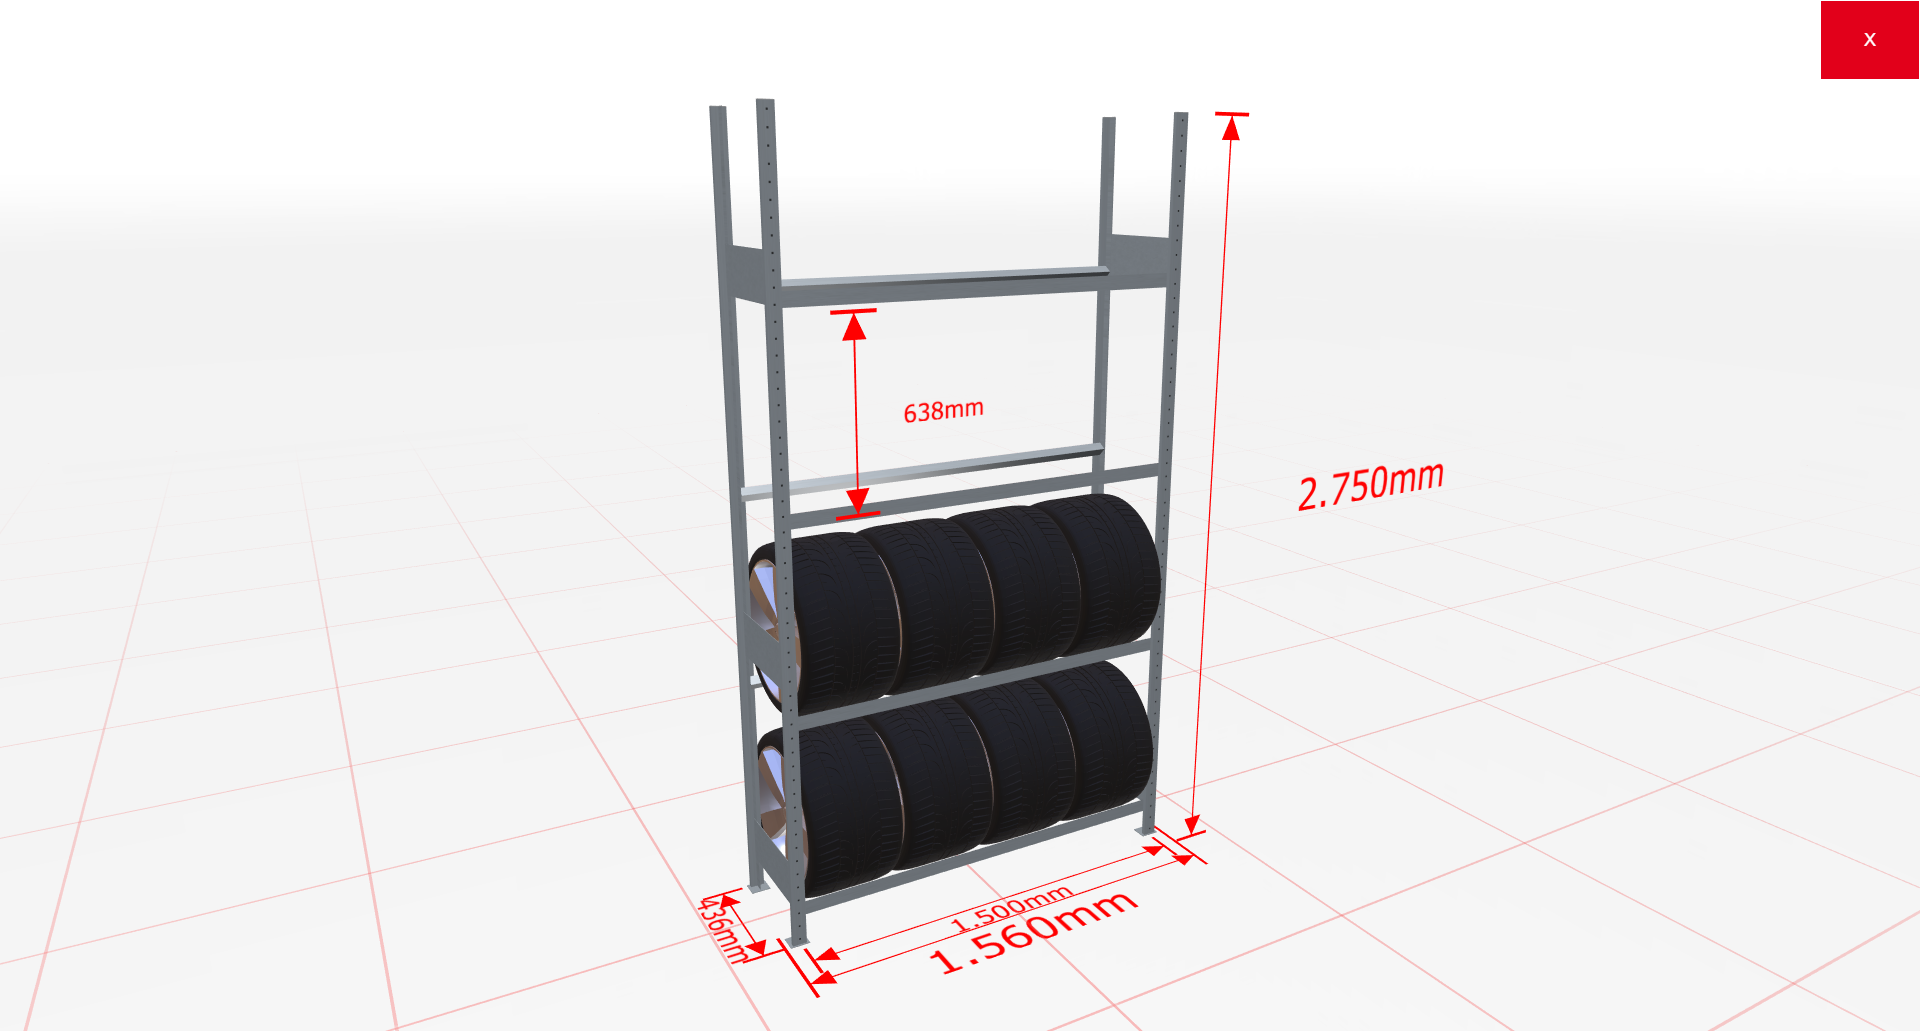 Räderregal Grundregal SCHULTE Lagertechnik 2750x1500x400 mm – 4 Ebenen á 1500 mm, verzinkt